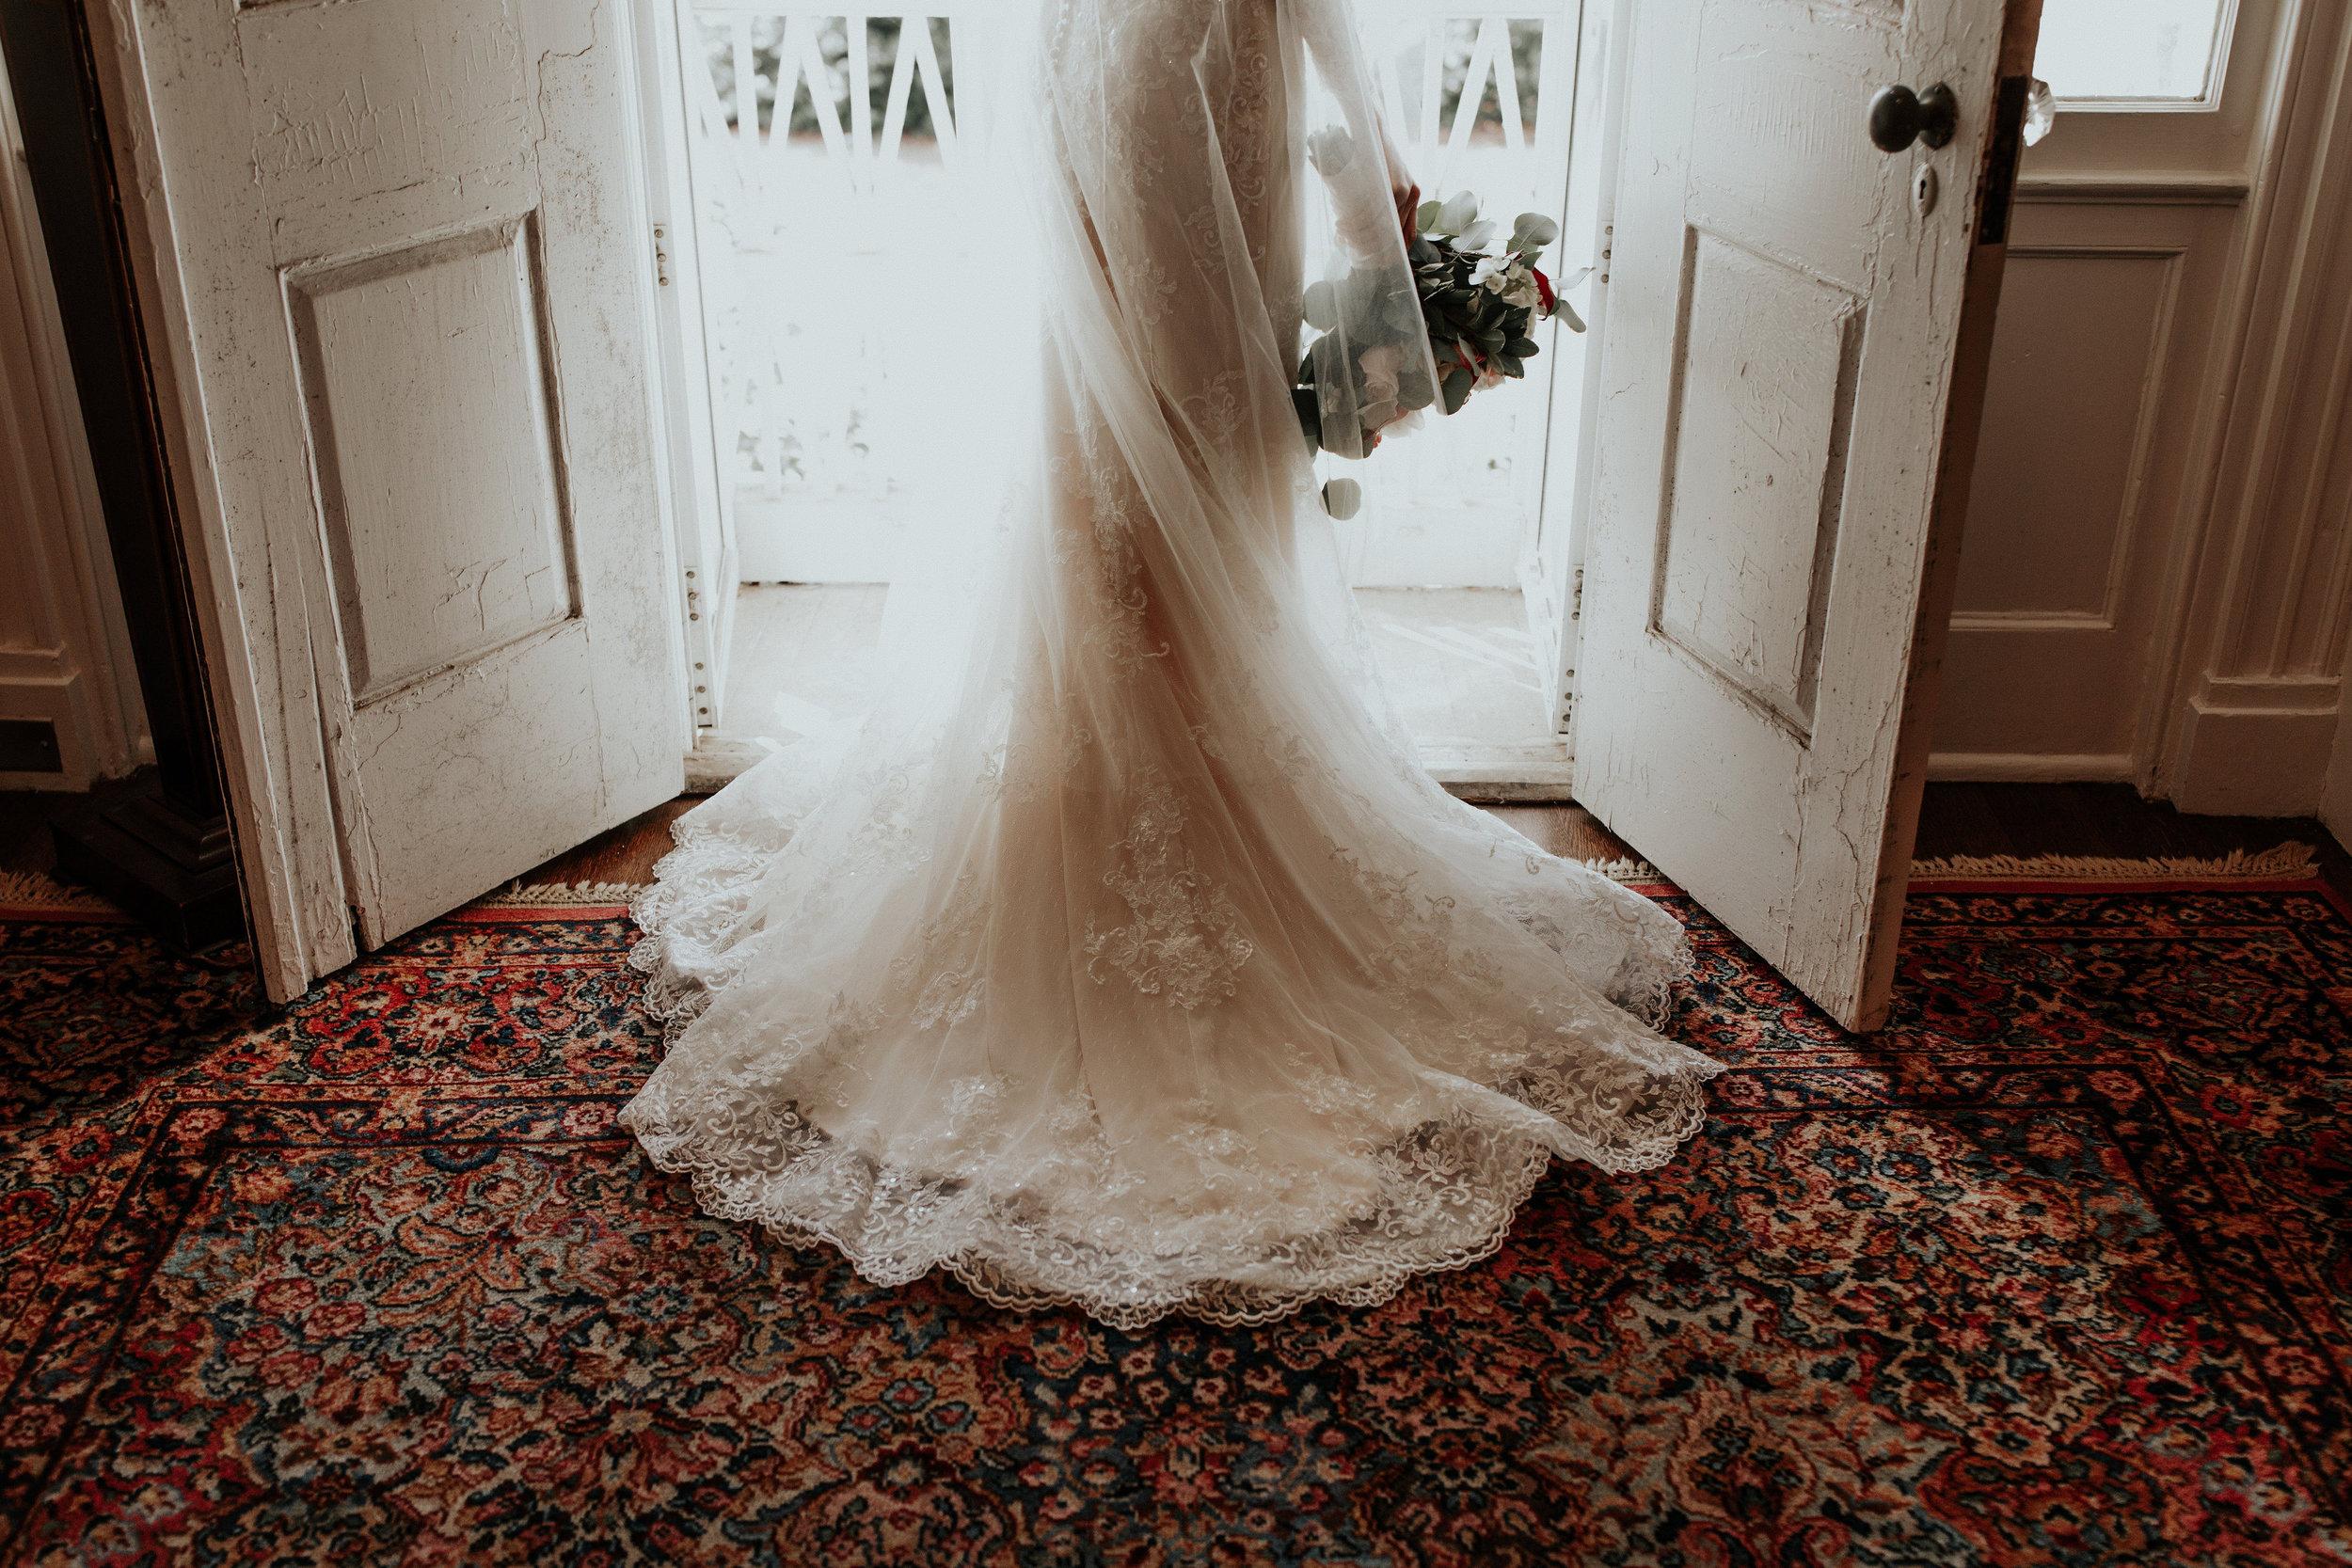 Madalynn_Young_Photography_Atlanta_Wedding_Photographer_Kara_Peyton_Tuscaloosa_Alabama_Wedding-82.JPG